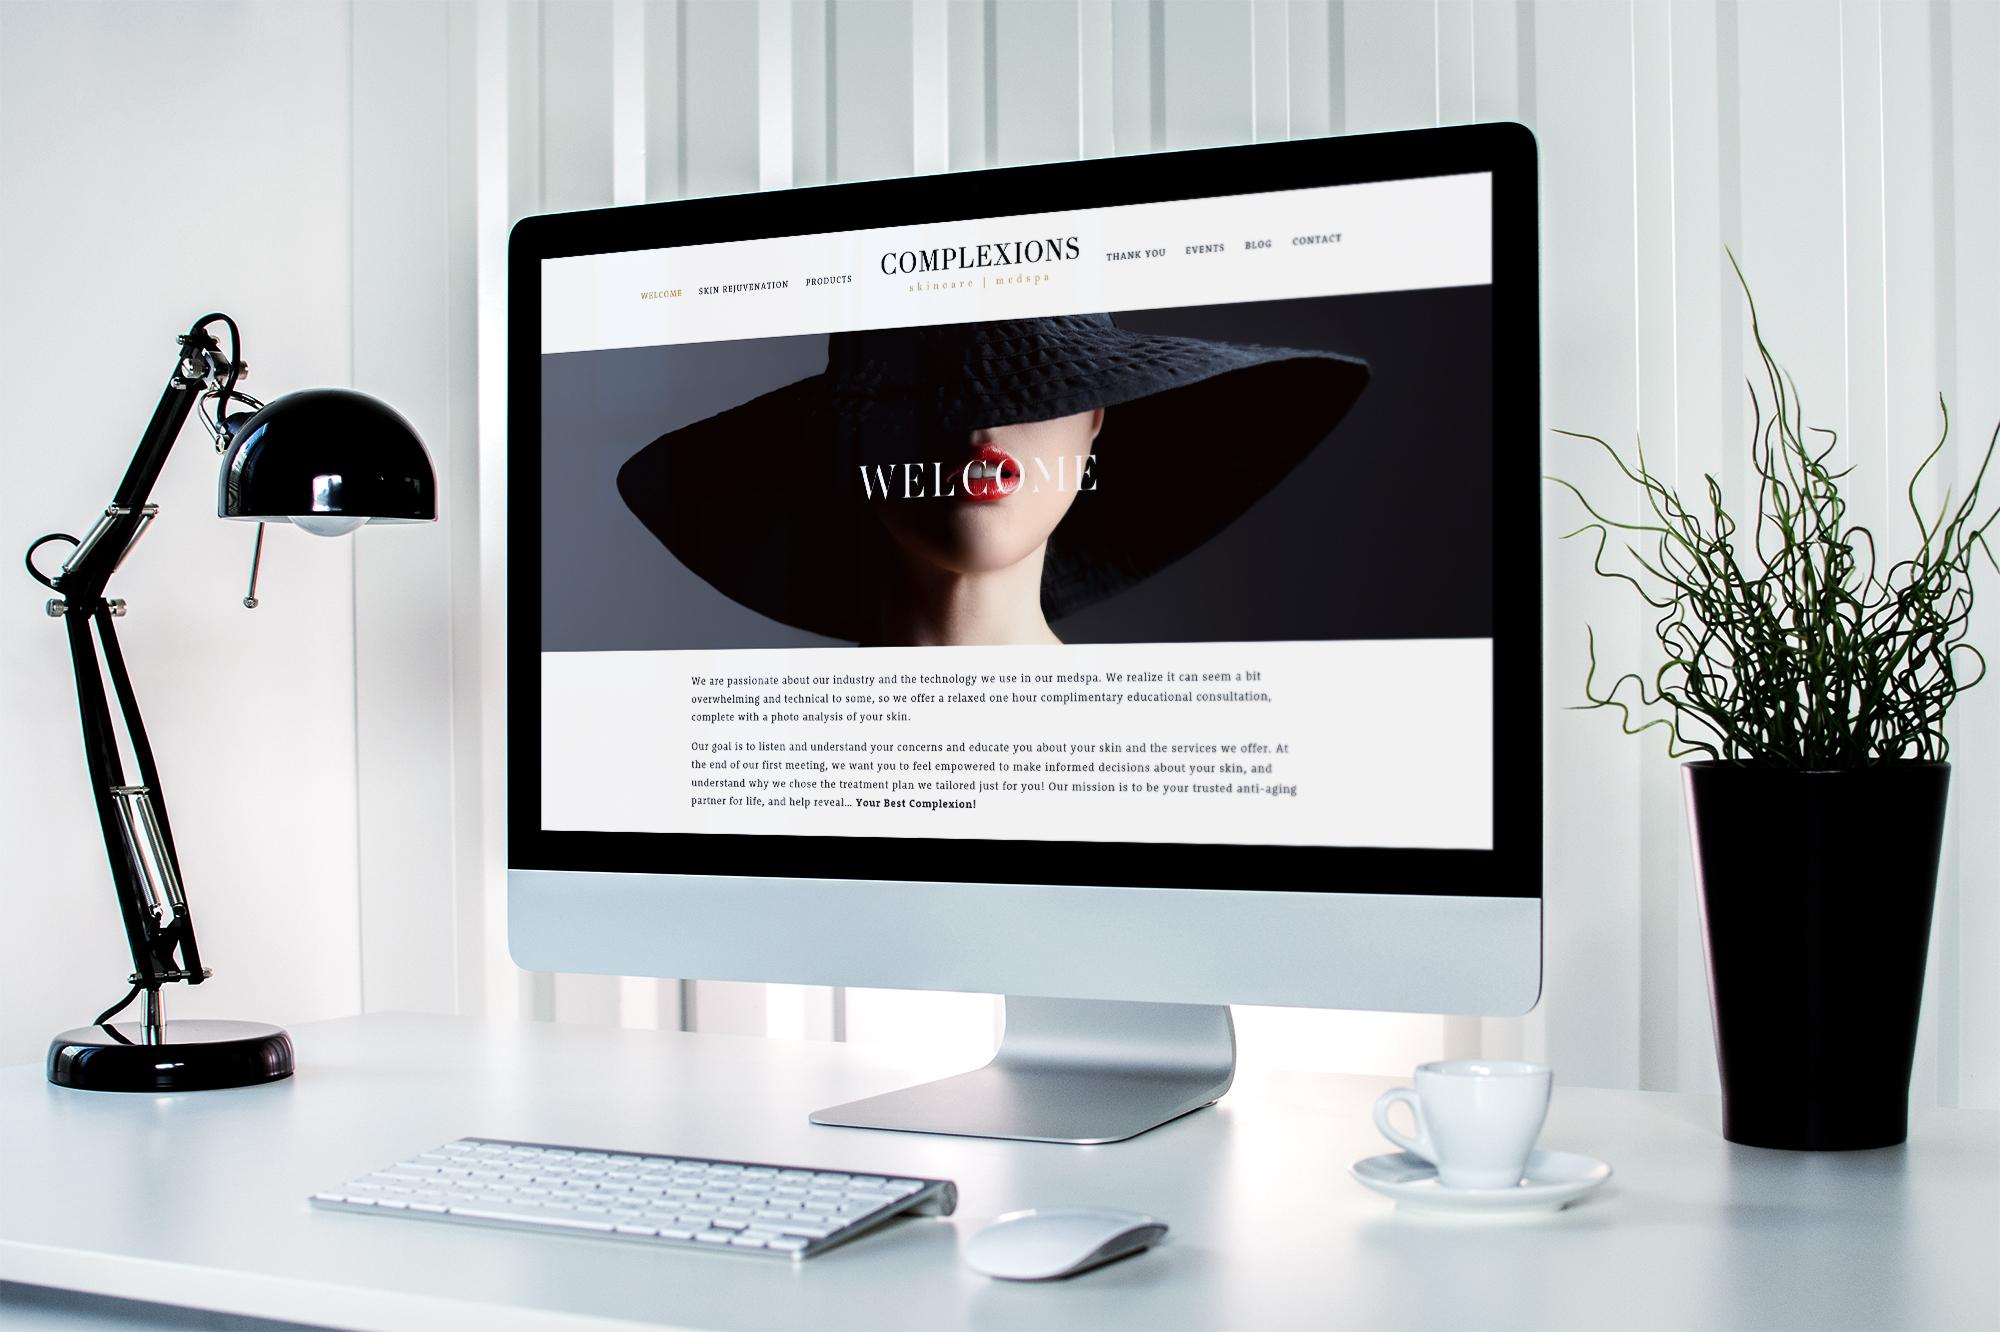 Complexions Skincare Medspa Website by Leesa Dykstra Designs.jpg